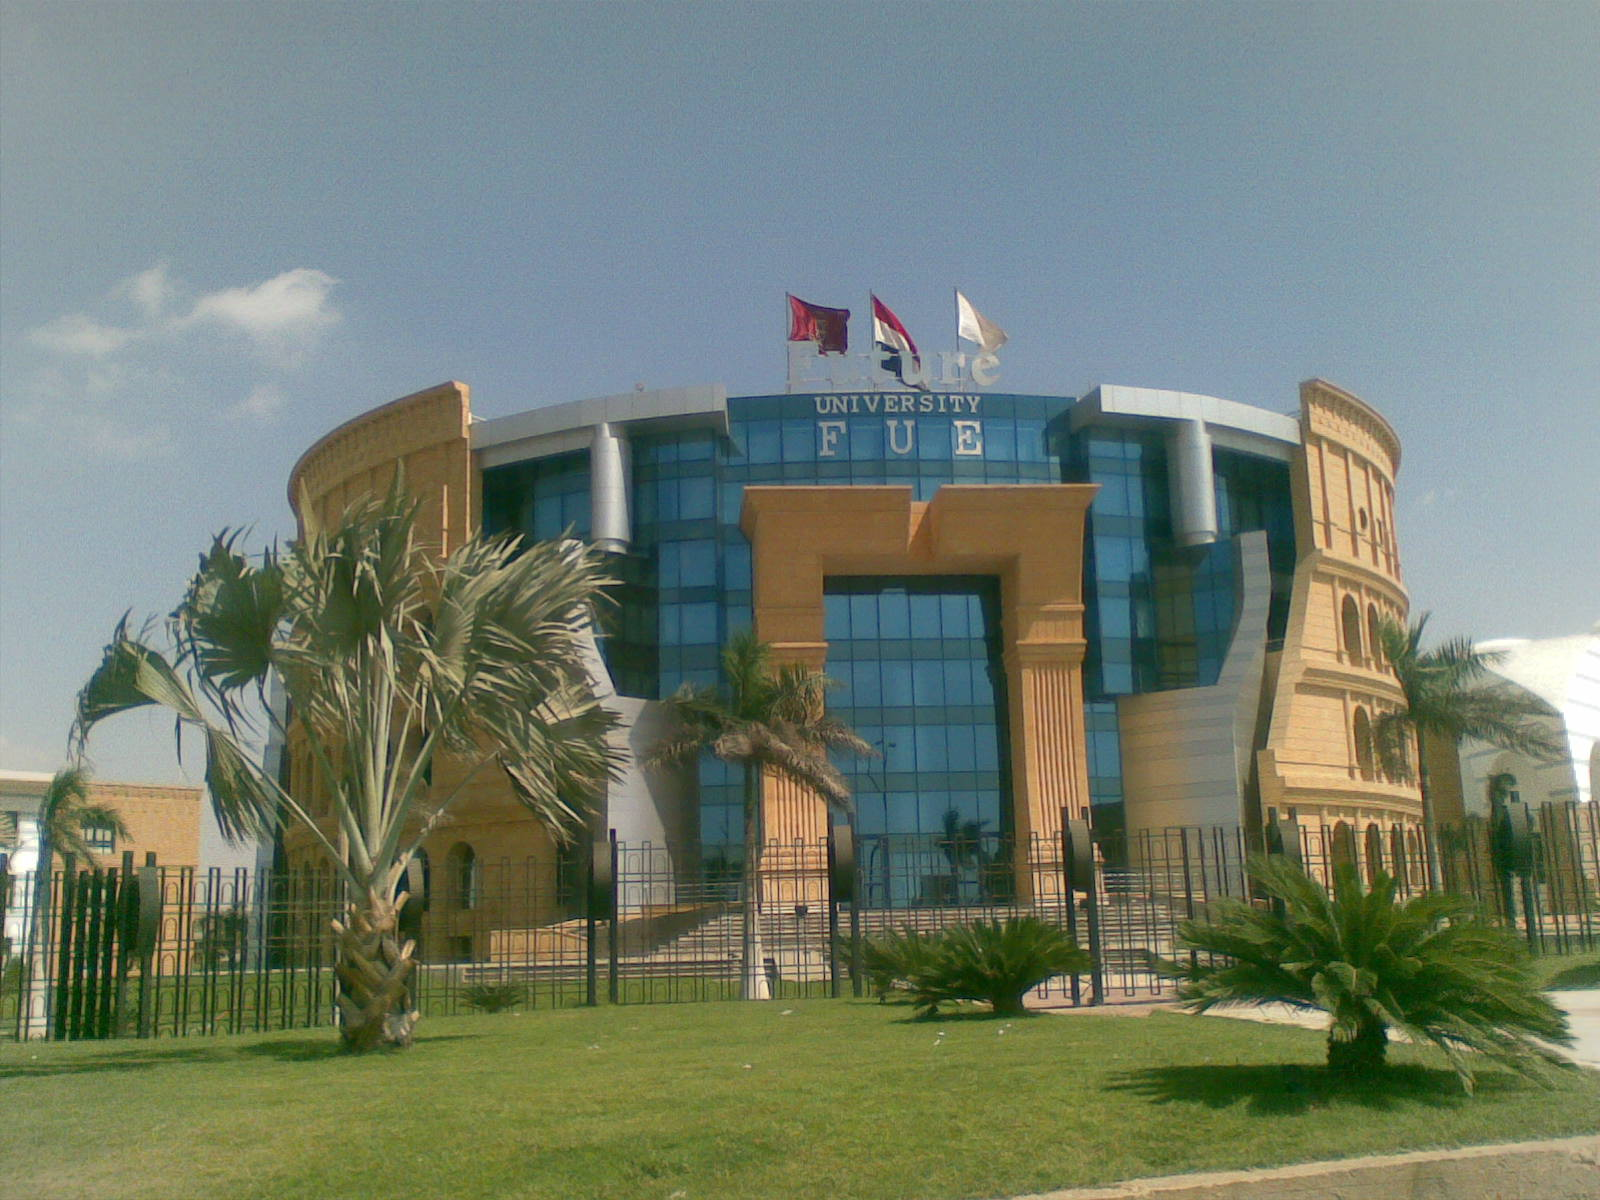 Future School Egypt Future University in Egypt